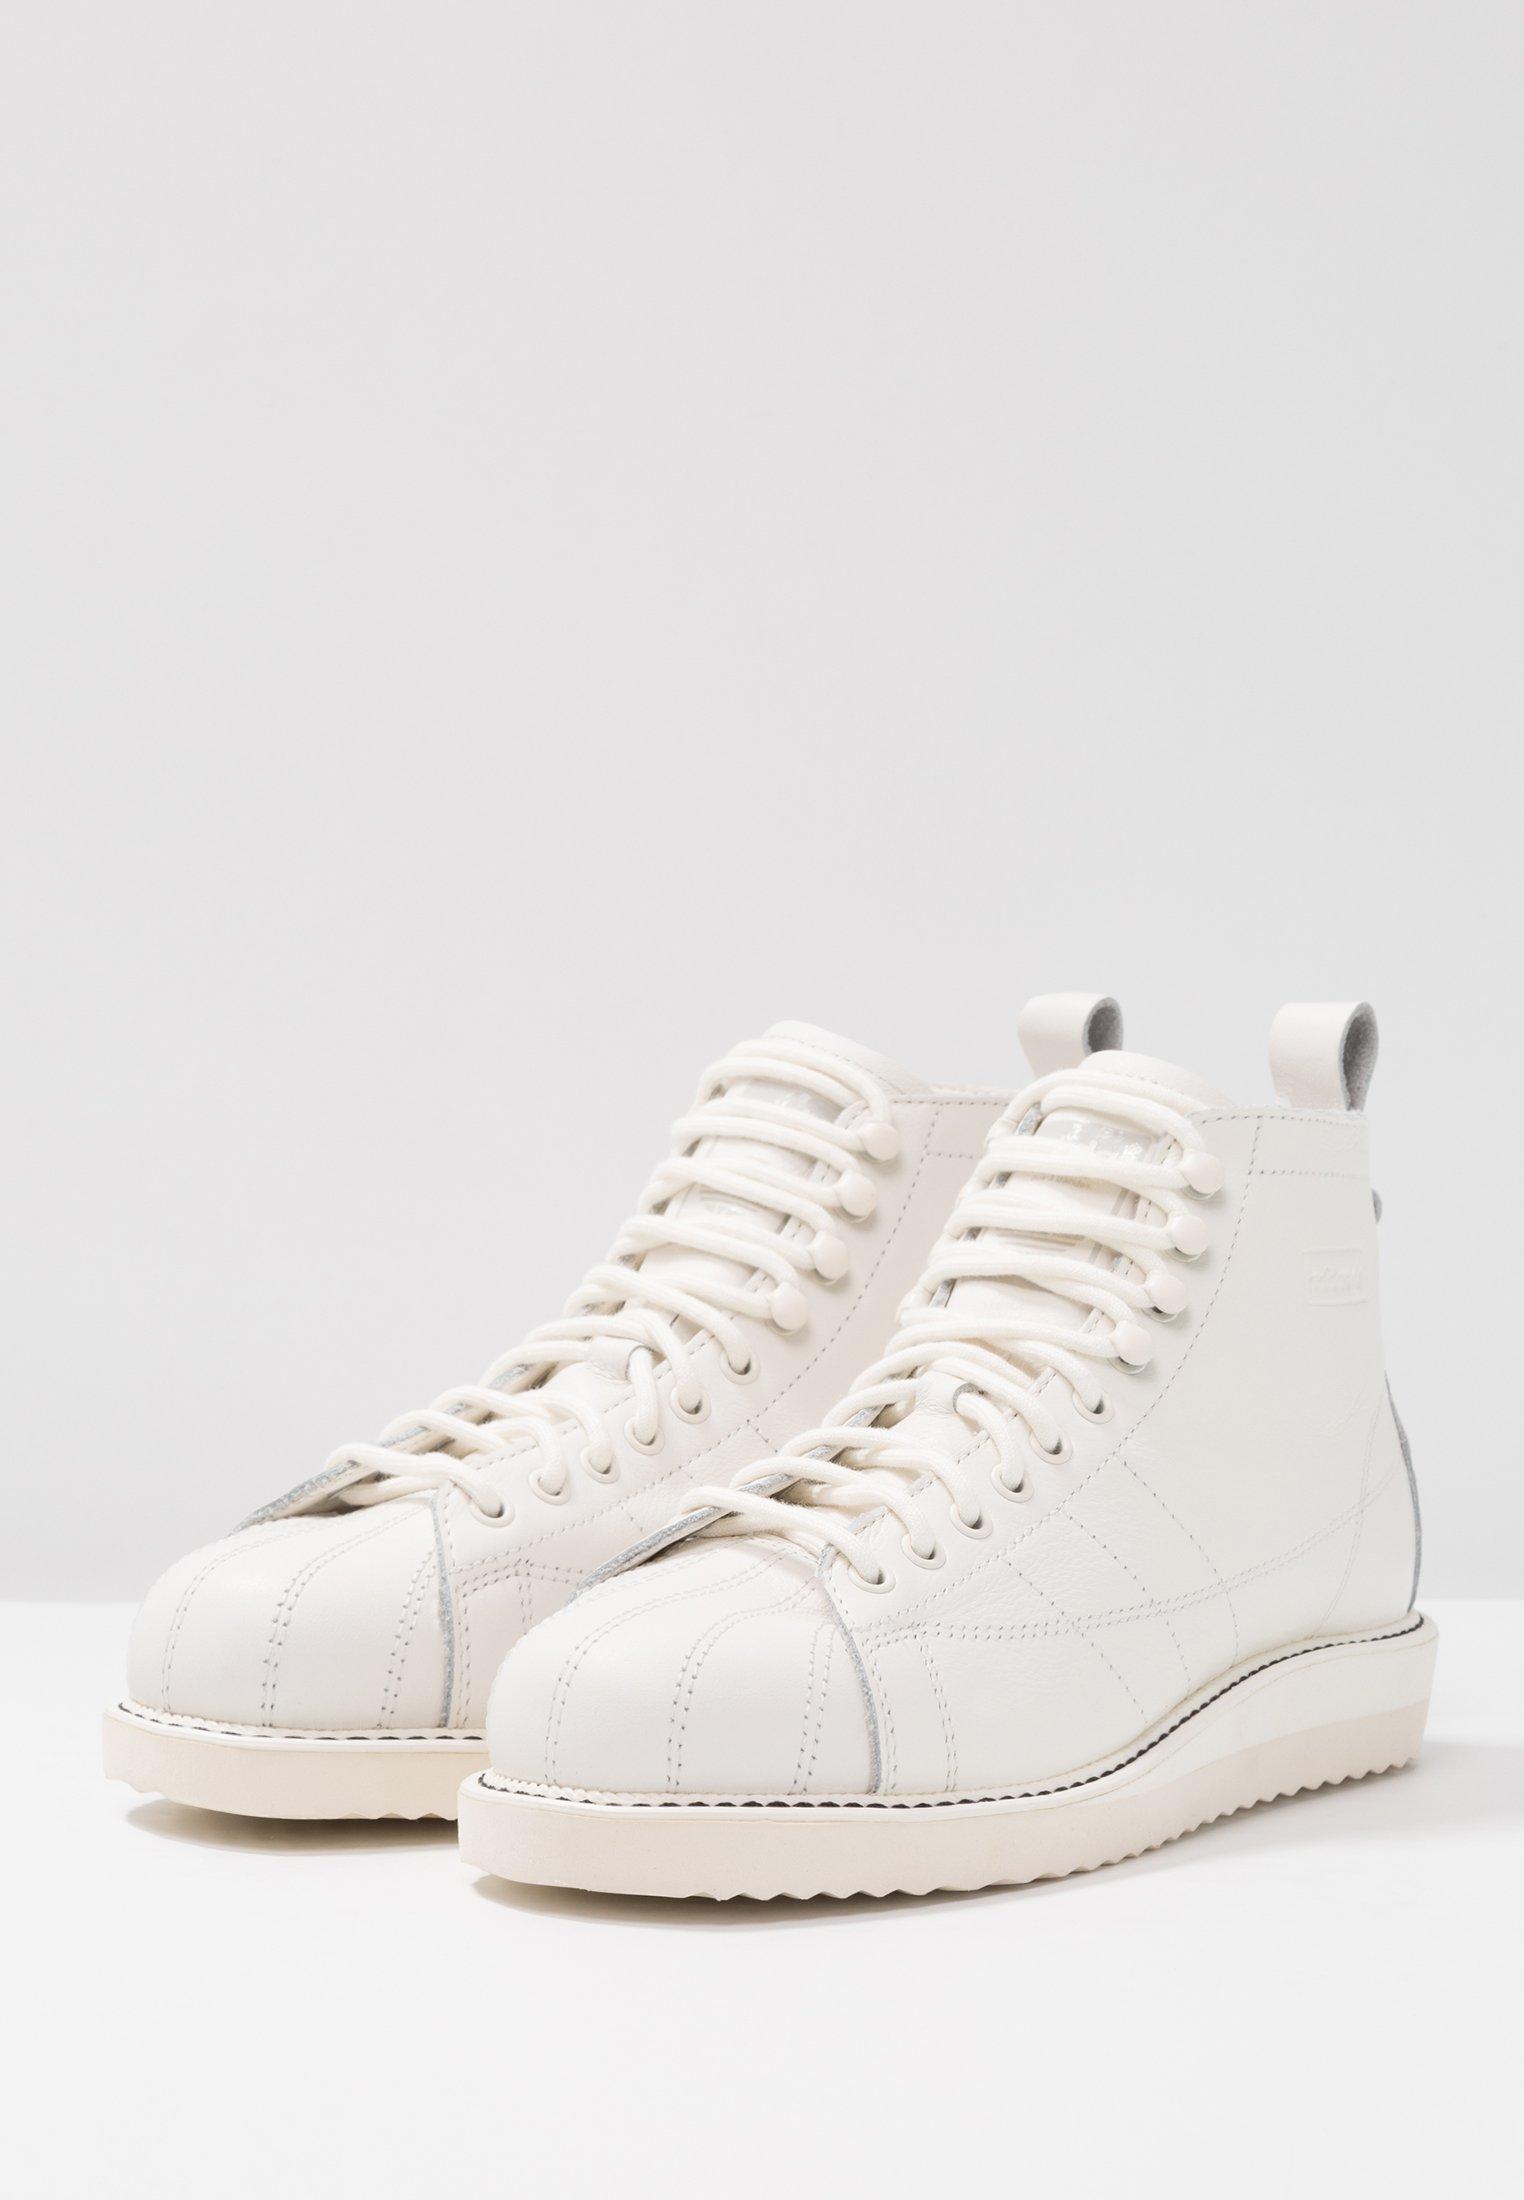 adidas Originals SUPERSTAR BOOT - Sneaker high - white - Black Friday